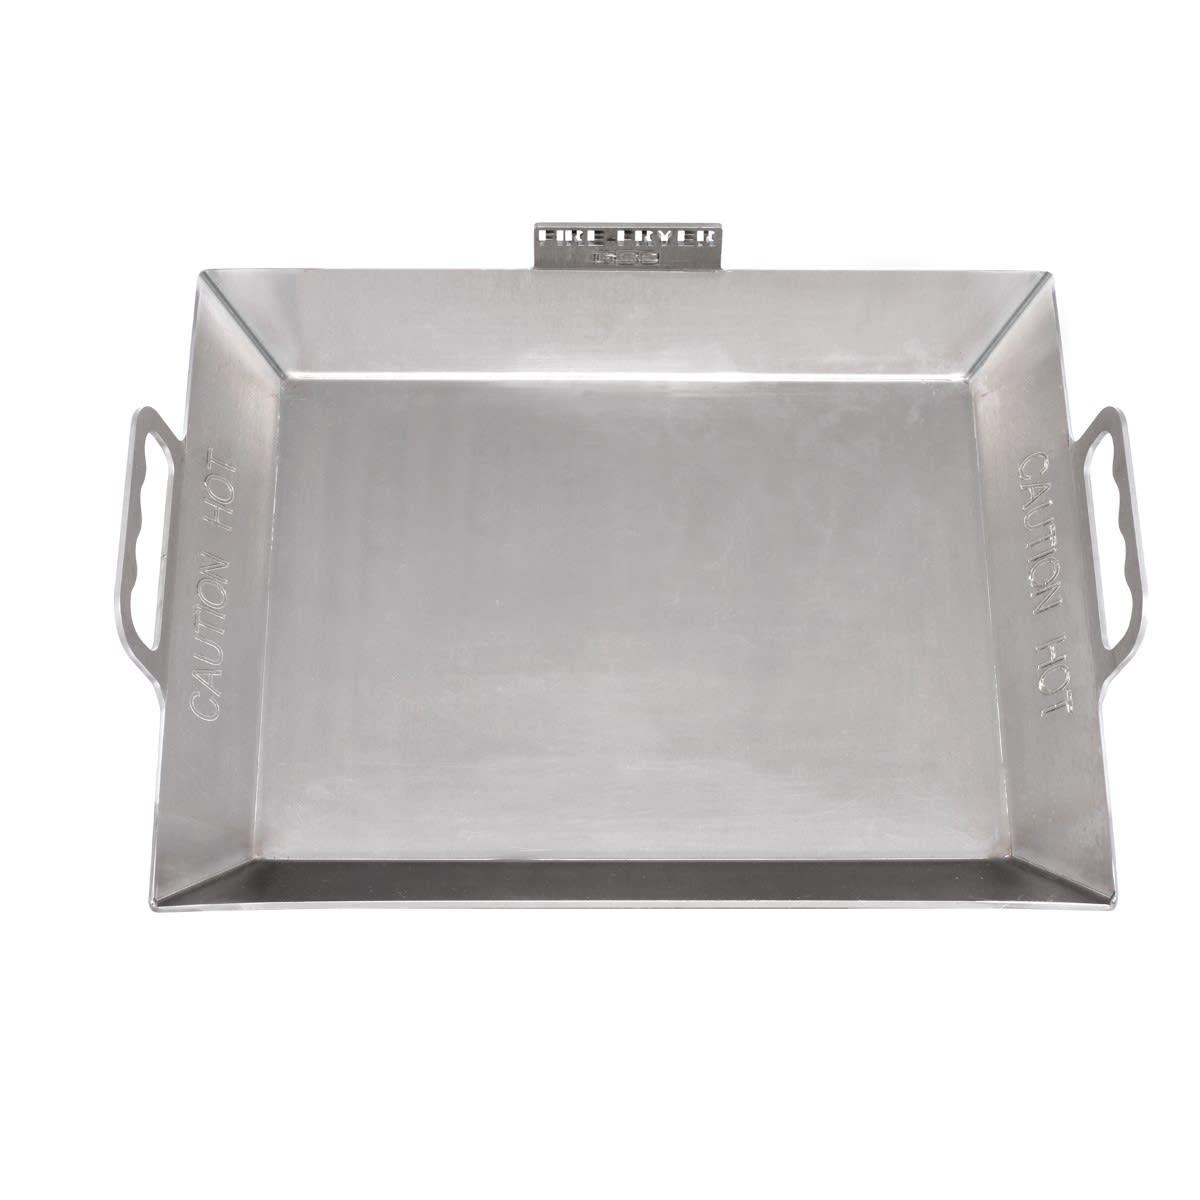 Fire Fryer Stainless Steel Braai Pan